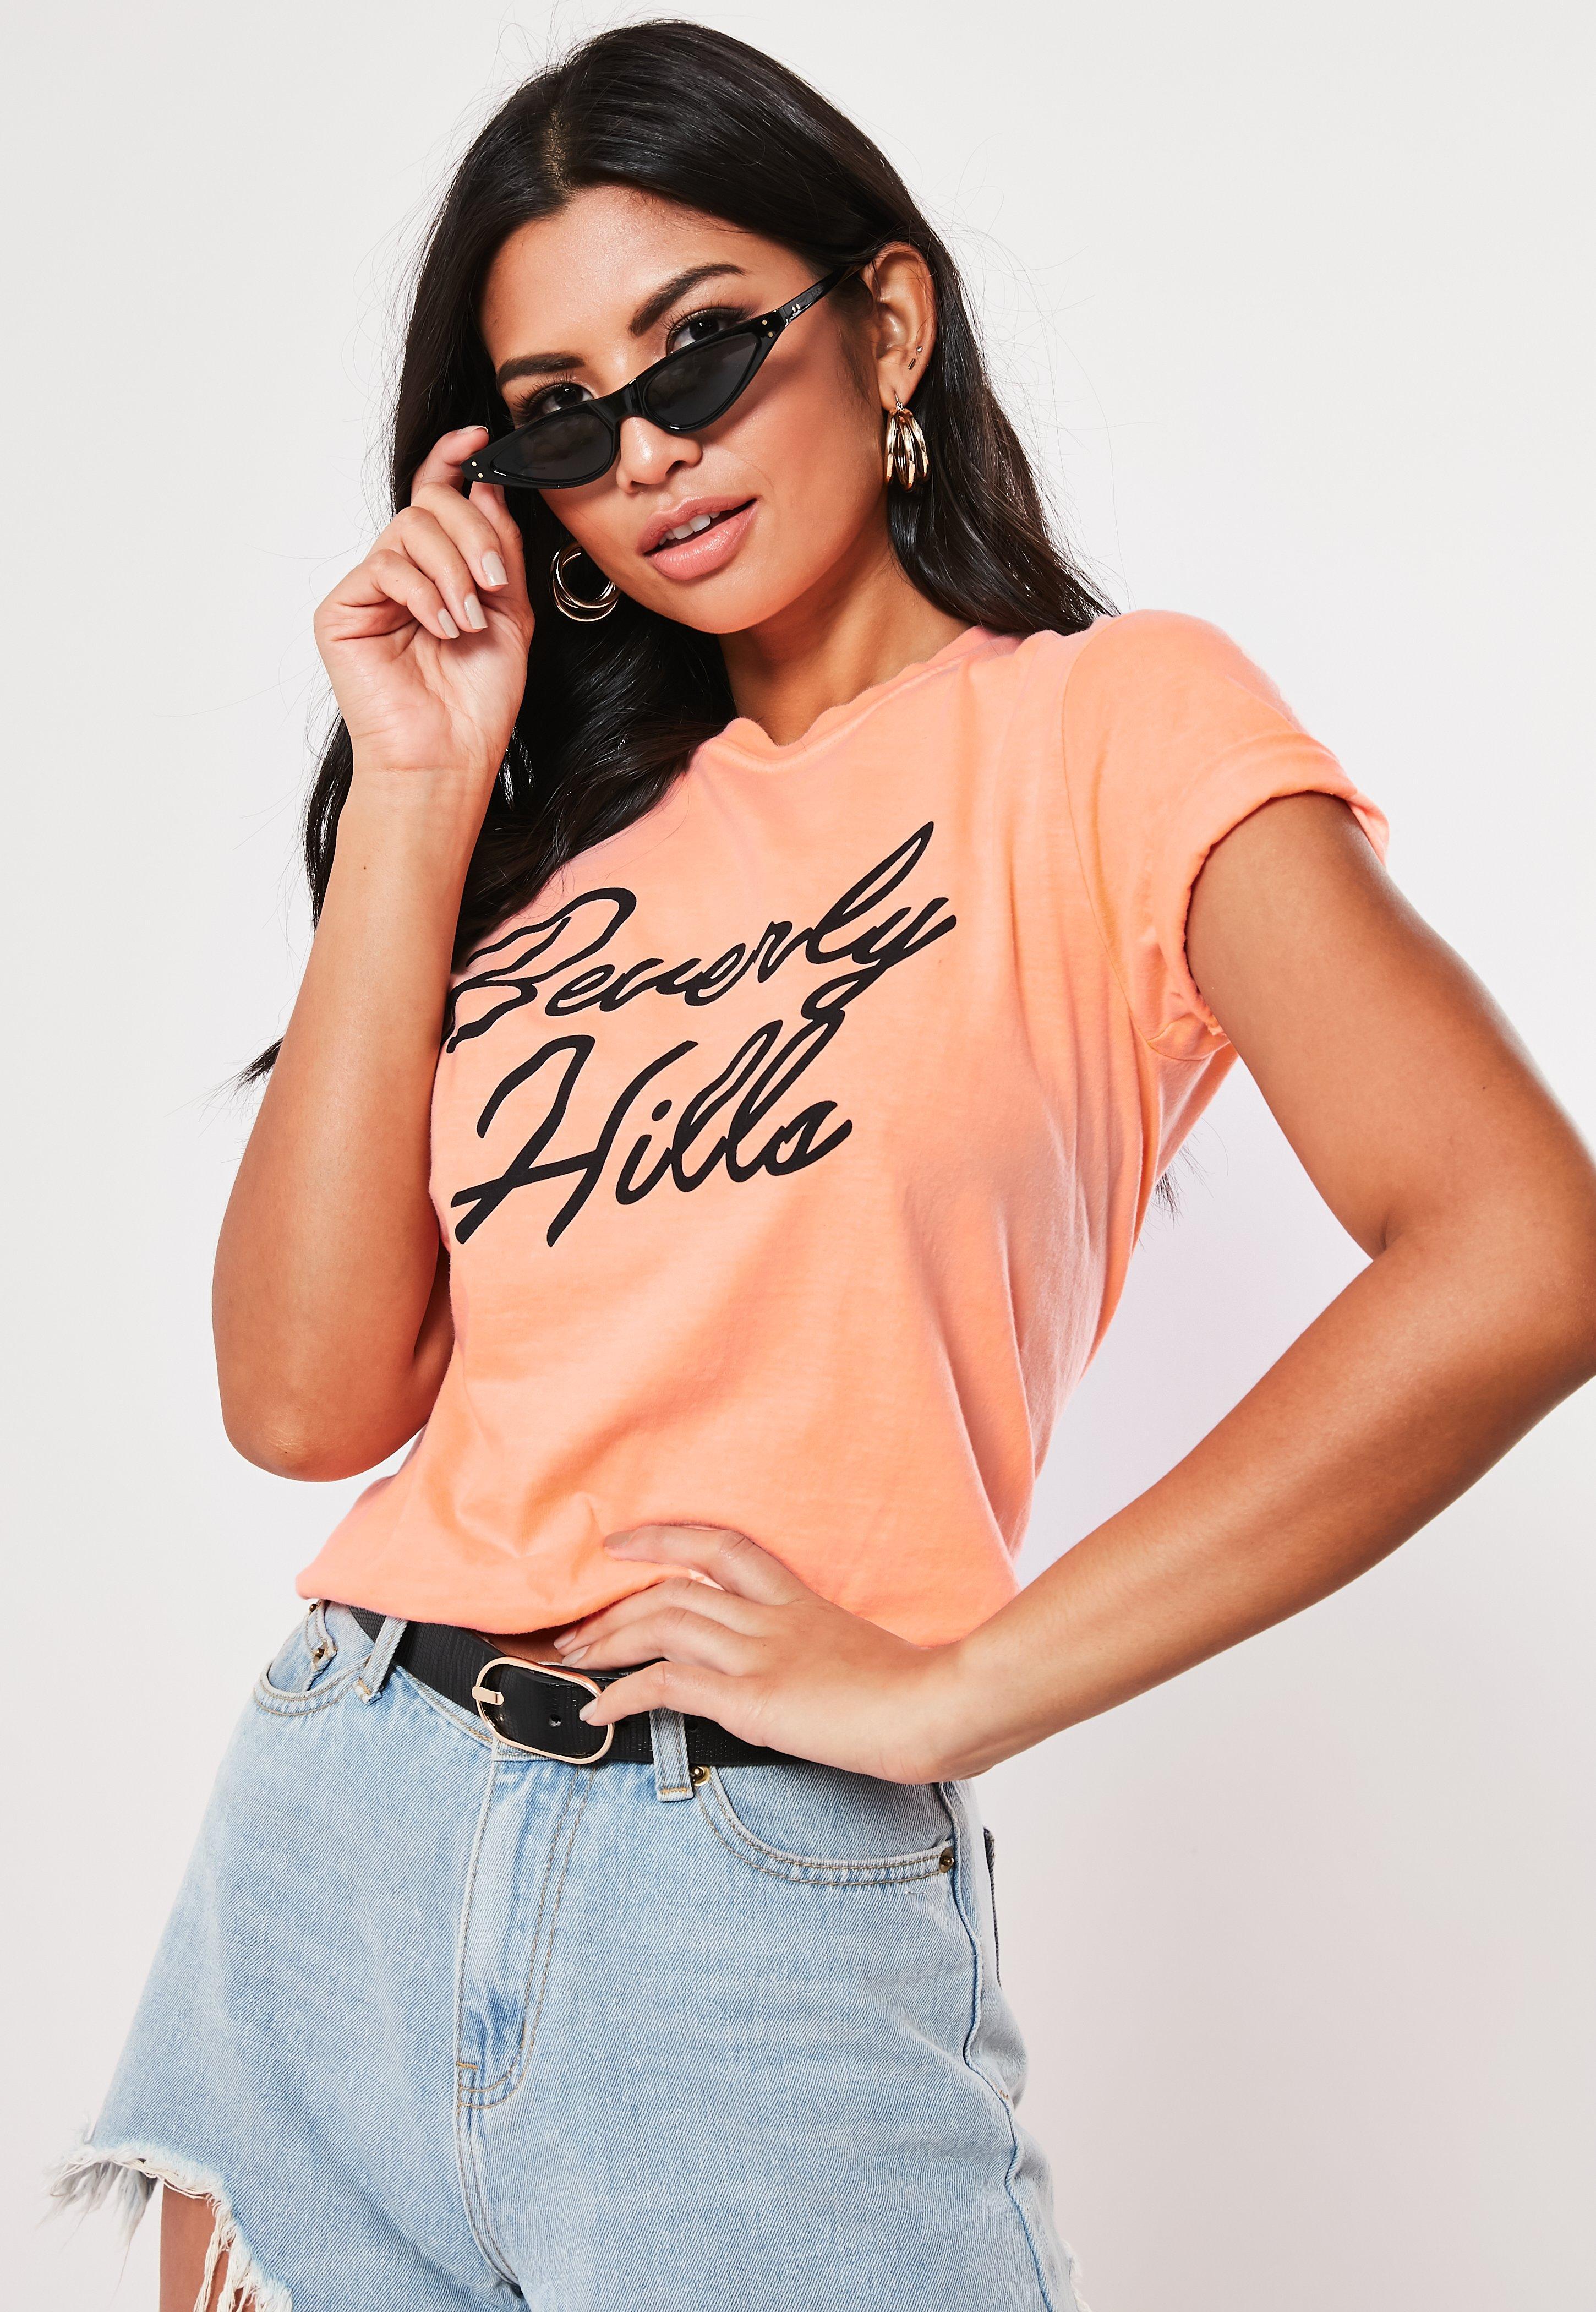 7c88911b7191 Slogan T-Shirts | Slogan Tees & Printed T-Shirts - Missguided